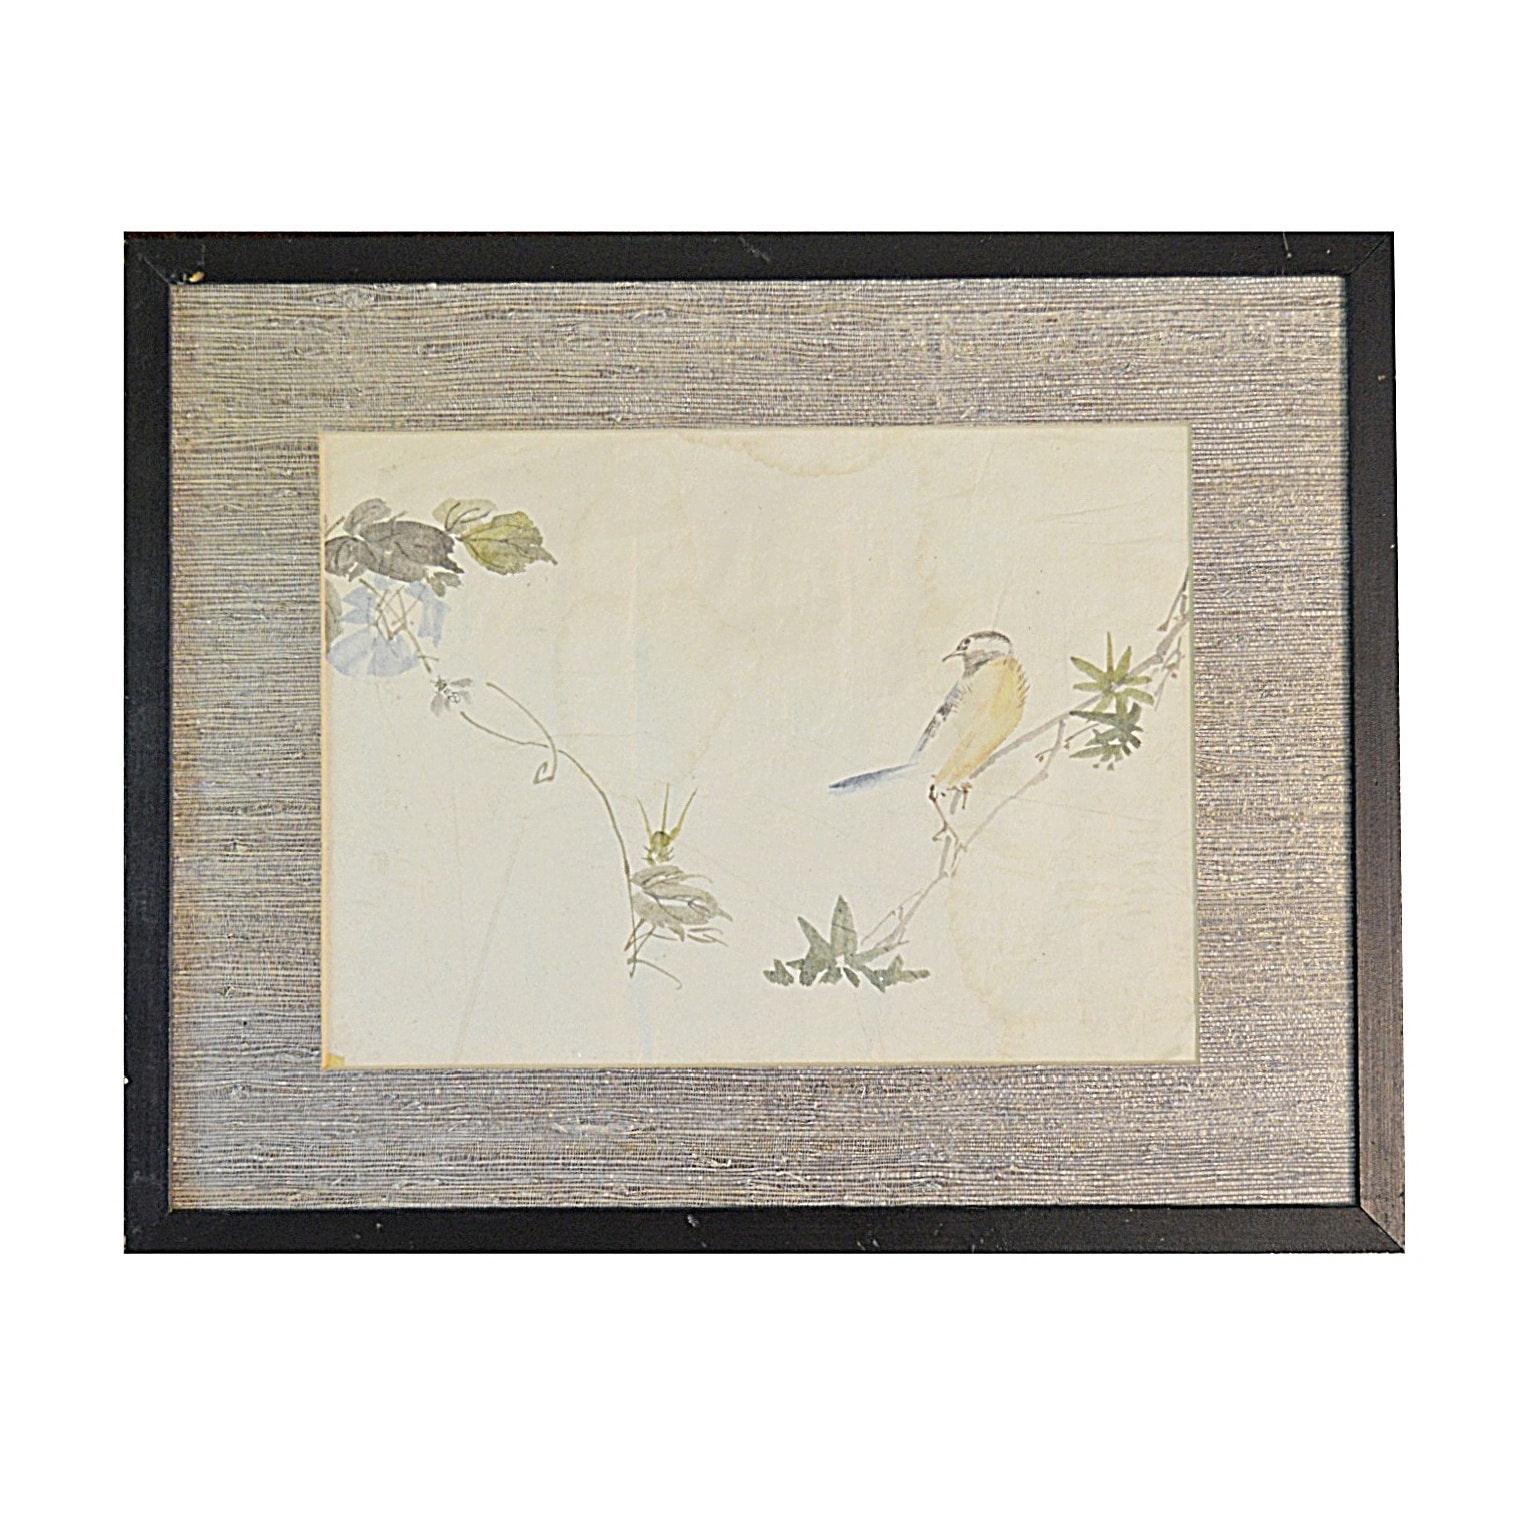 Original 19th Century Japanese Sumi-E Painting on Rice Paper